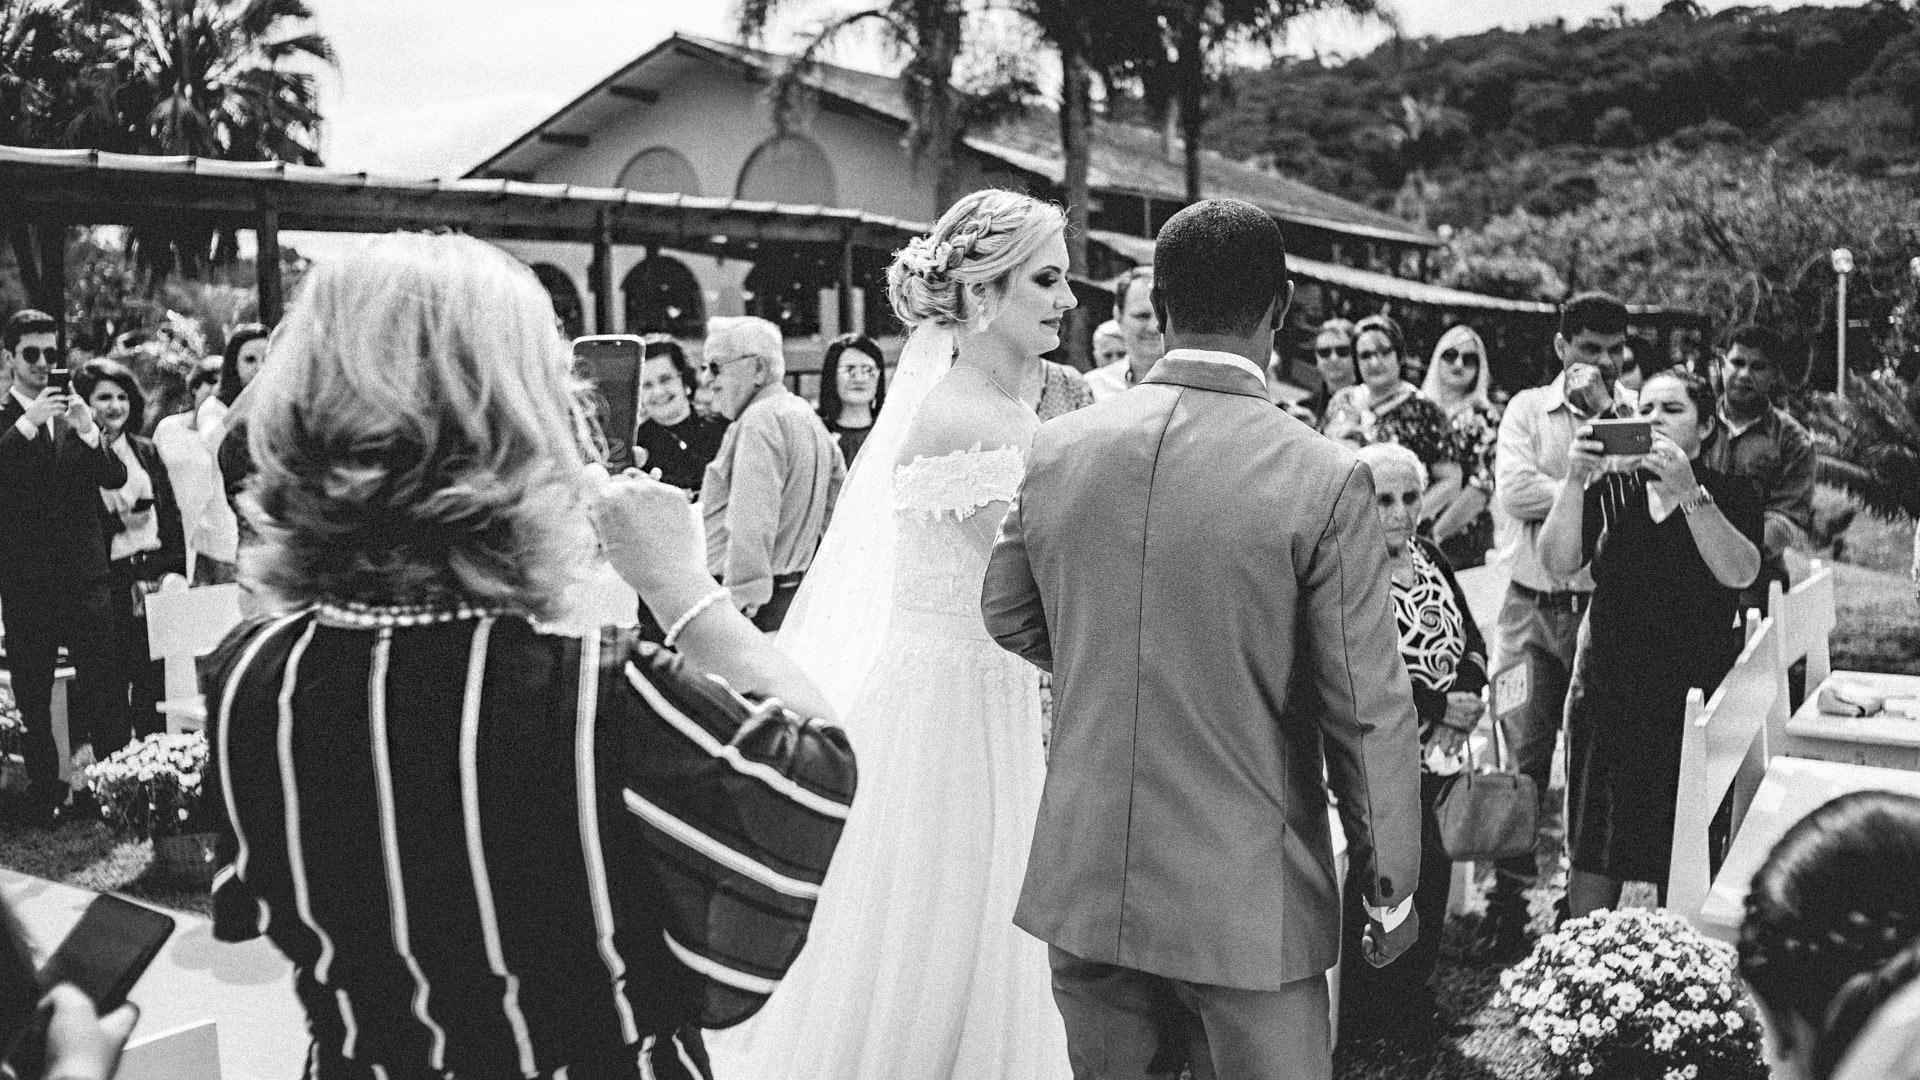 Convidados Fotografando o casamento